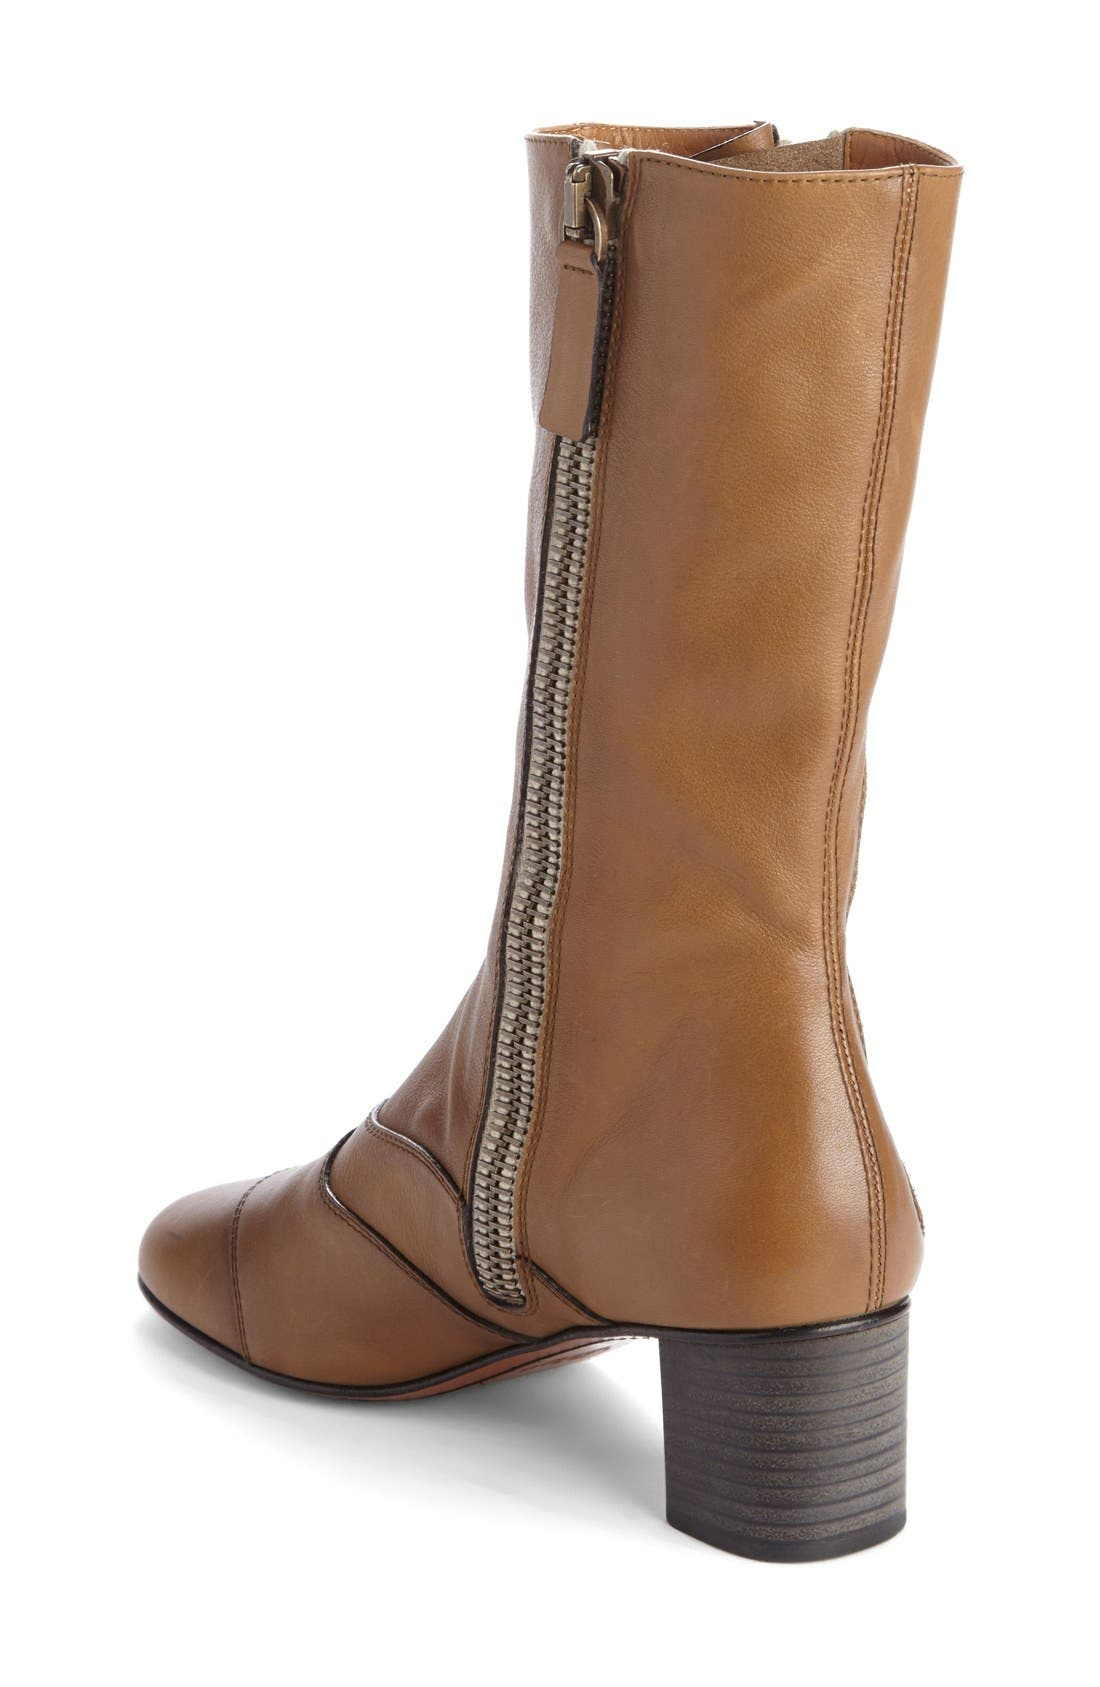 Alternate Image 2  - Chloé 'Lexie' Block Heel Boot (Women)